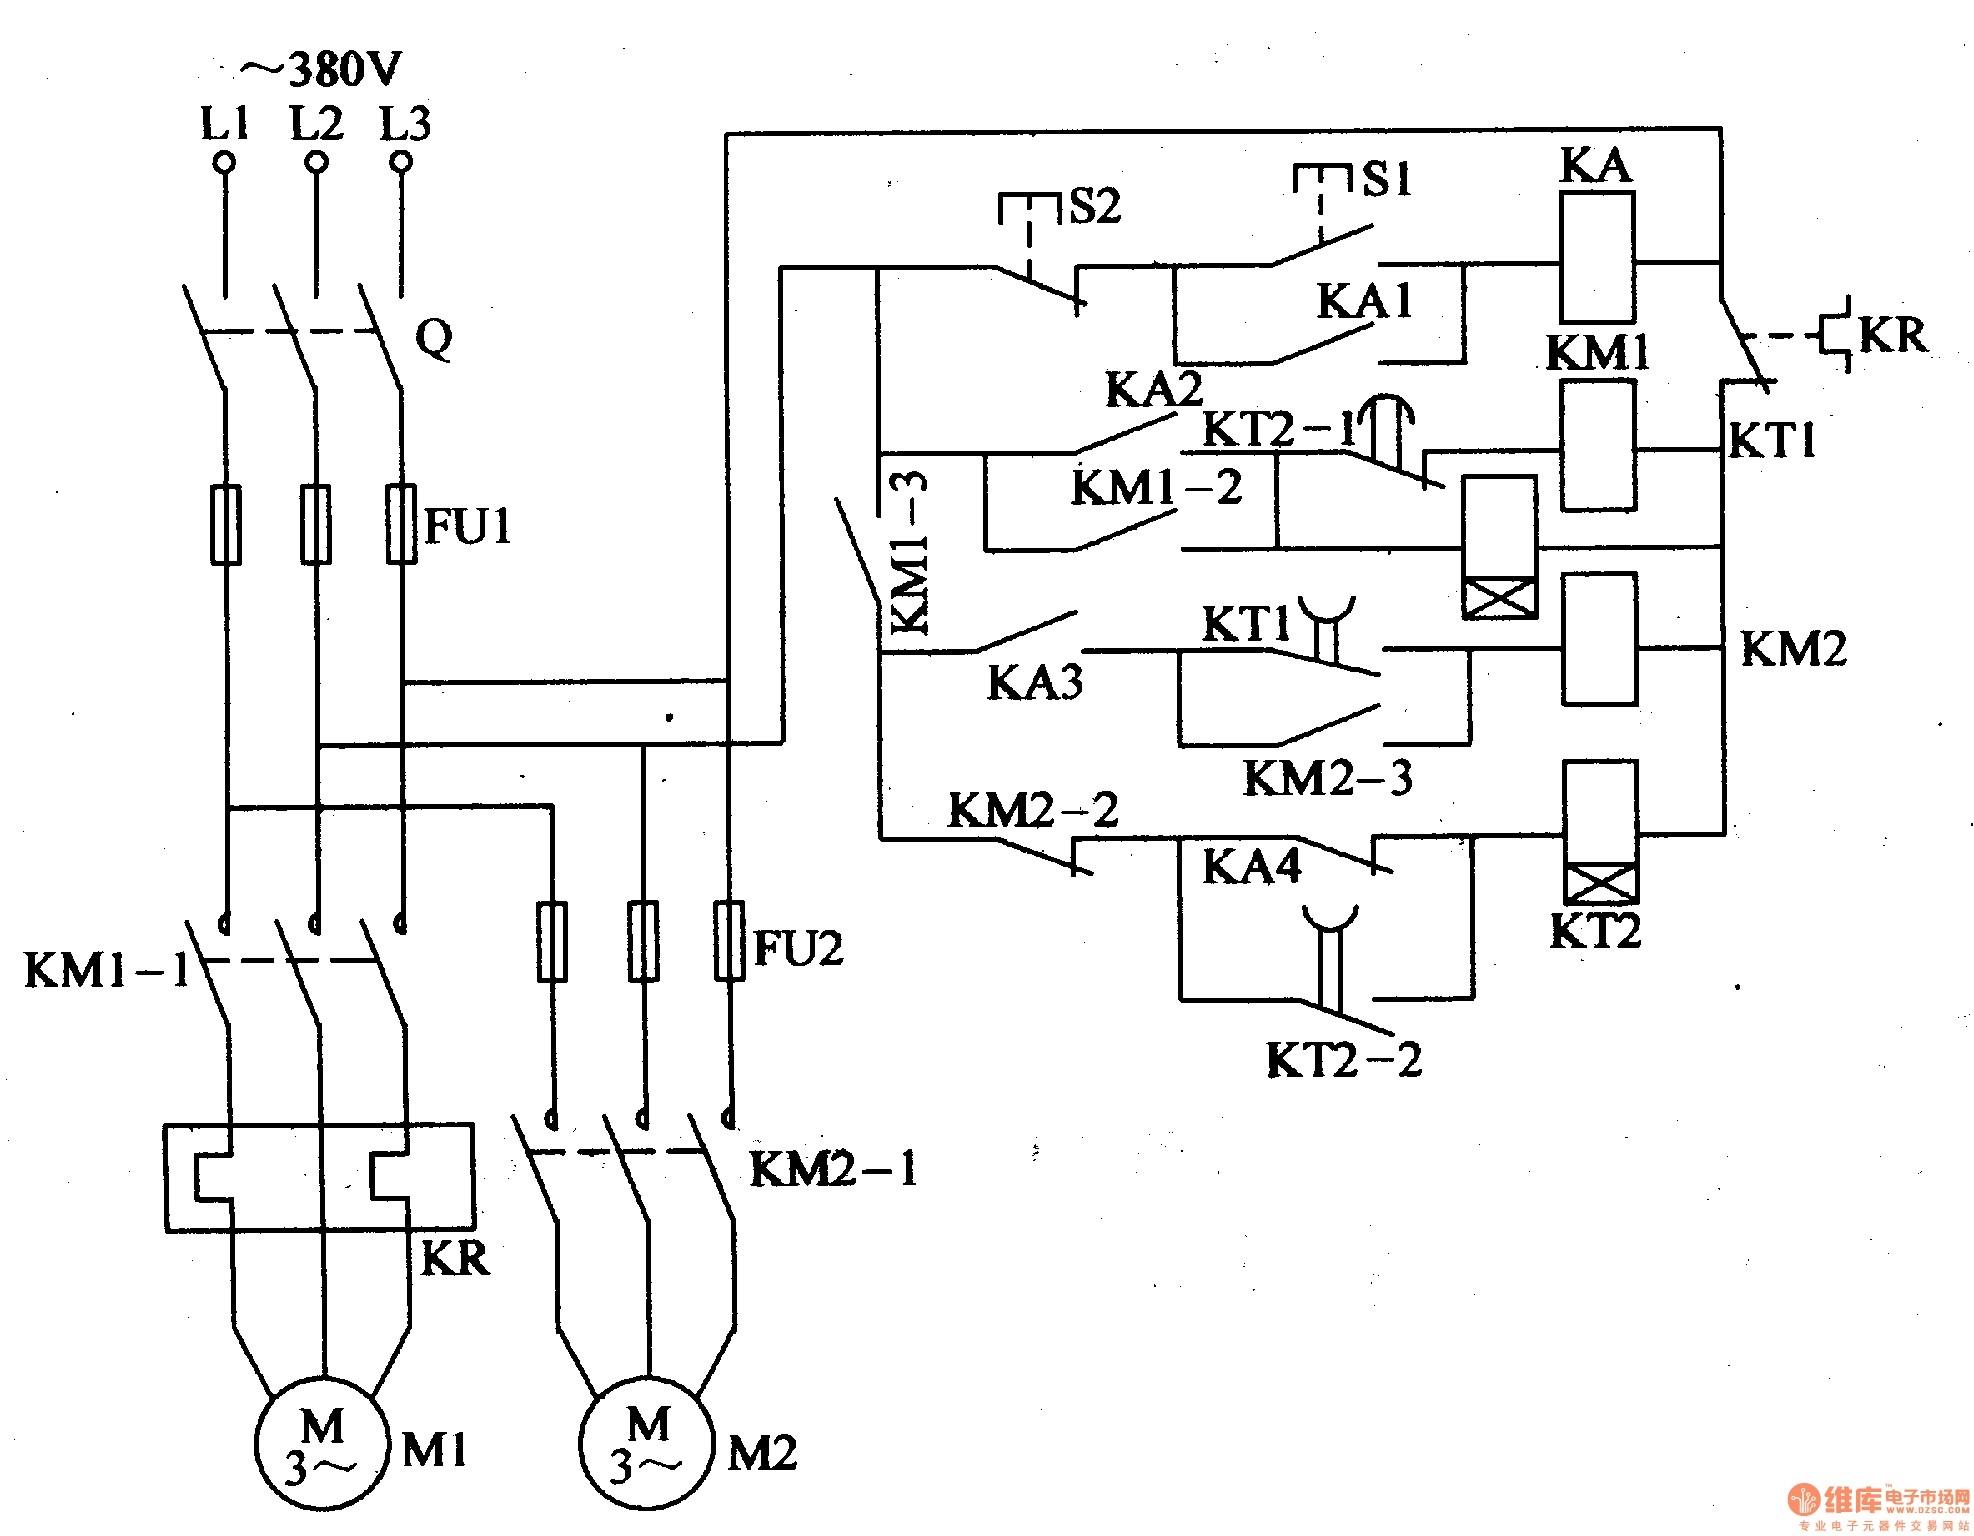 plc control panel wiring diagram pdf Collection-Wiring Diagram Plc Pdf Save Electrical Control Panel Wiring Diagram Pdf Beautiful Hydralic Shear 1-t